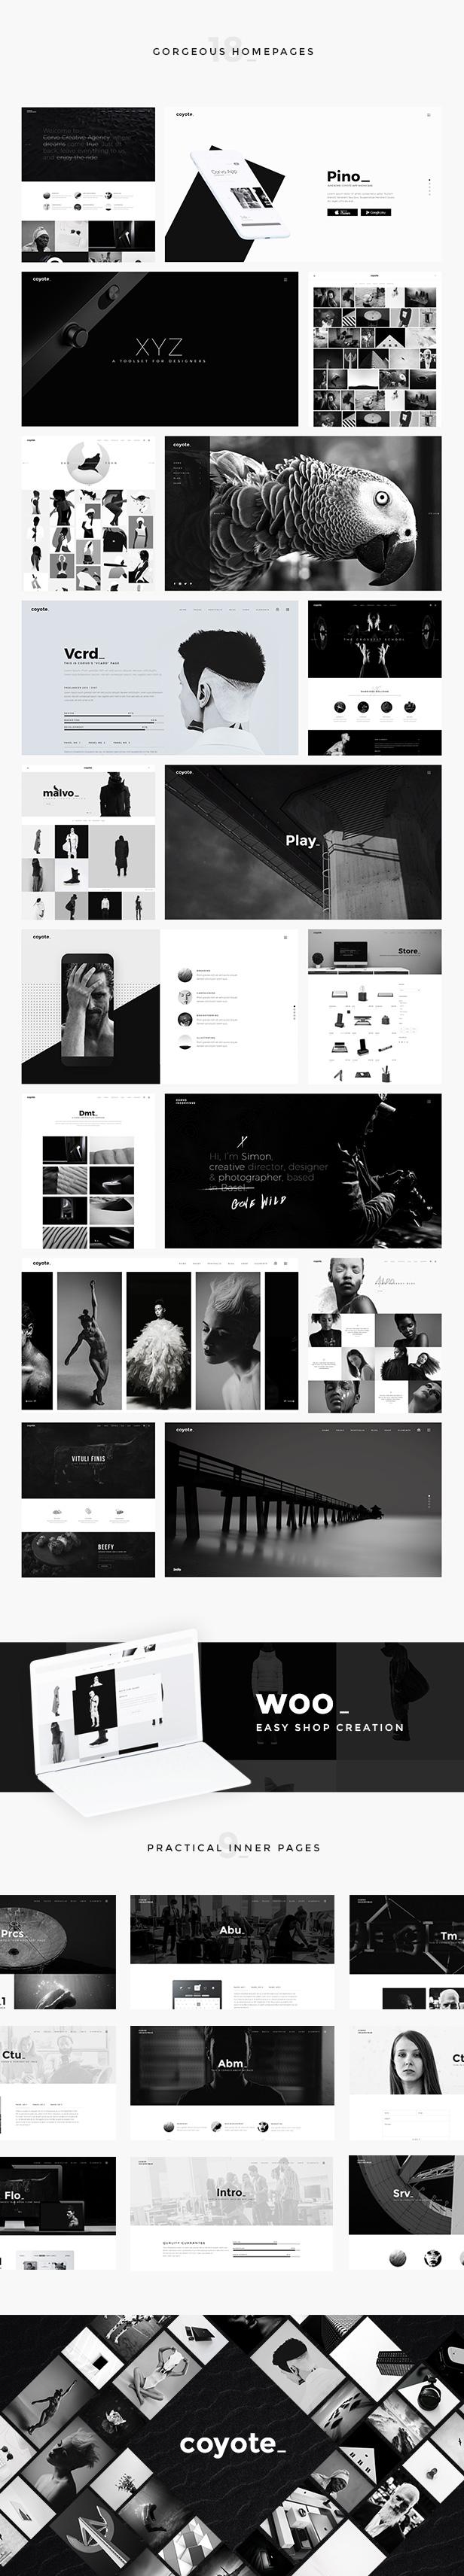 Coyote - Multipurpose WordPress Theme - 1